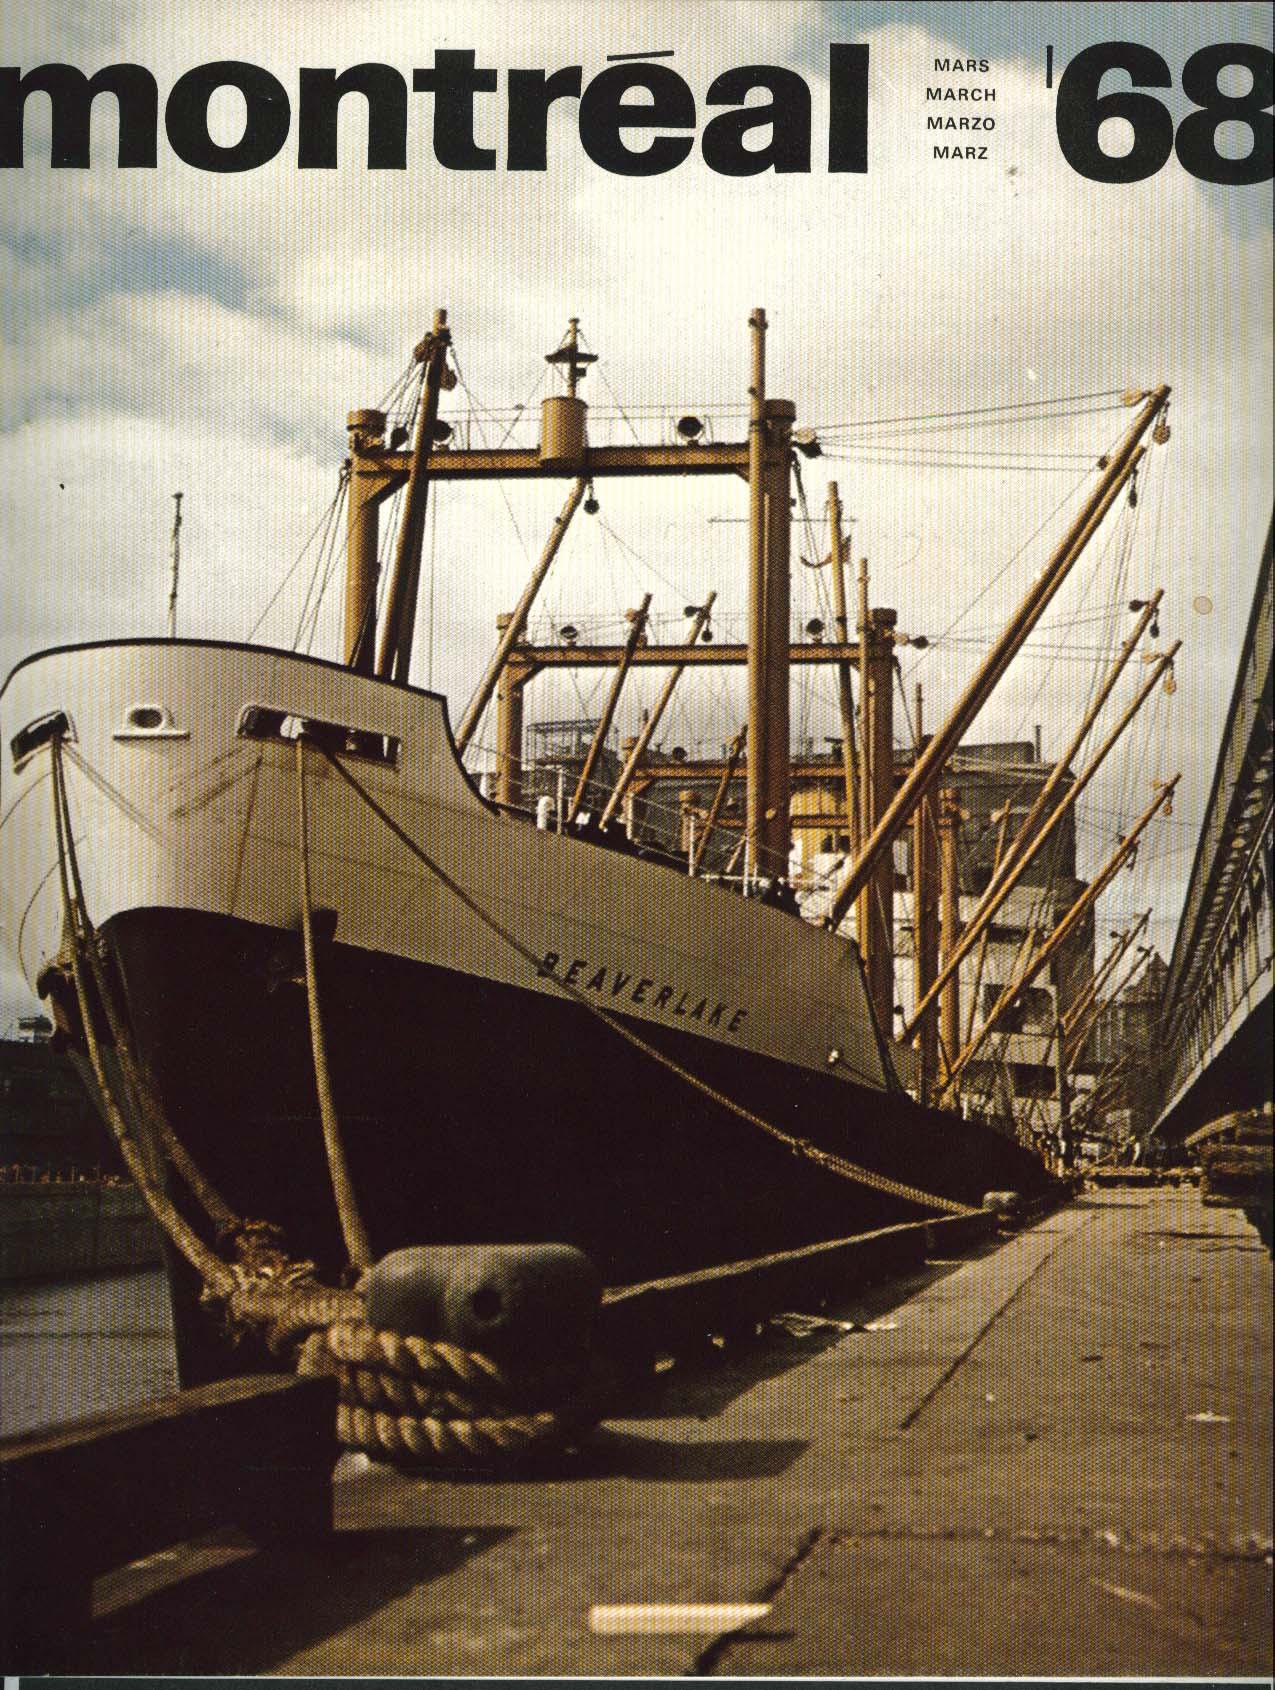 MONTREAL Port of Montreal Beaverlake Polyglot 3 1968